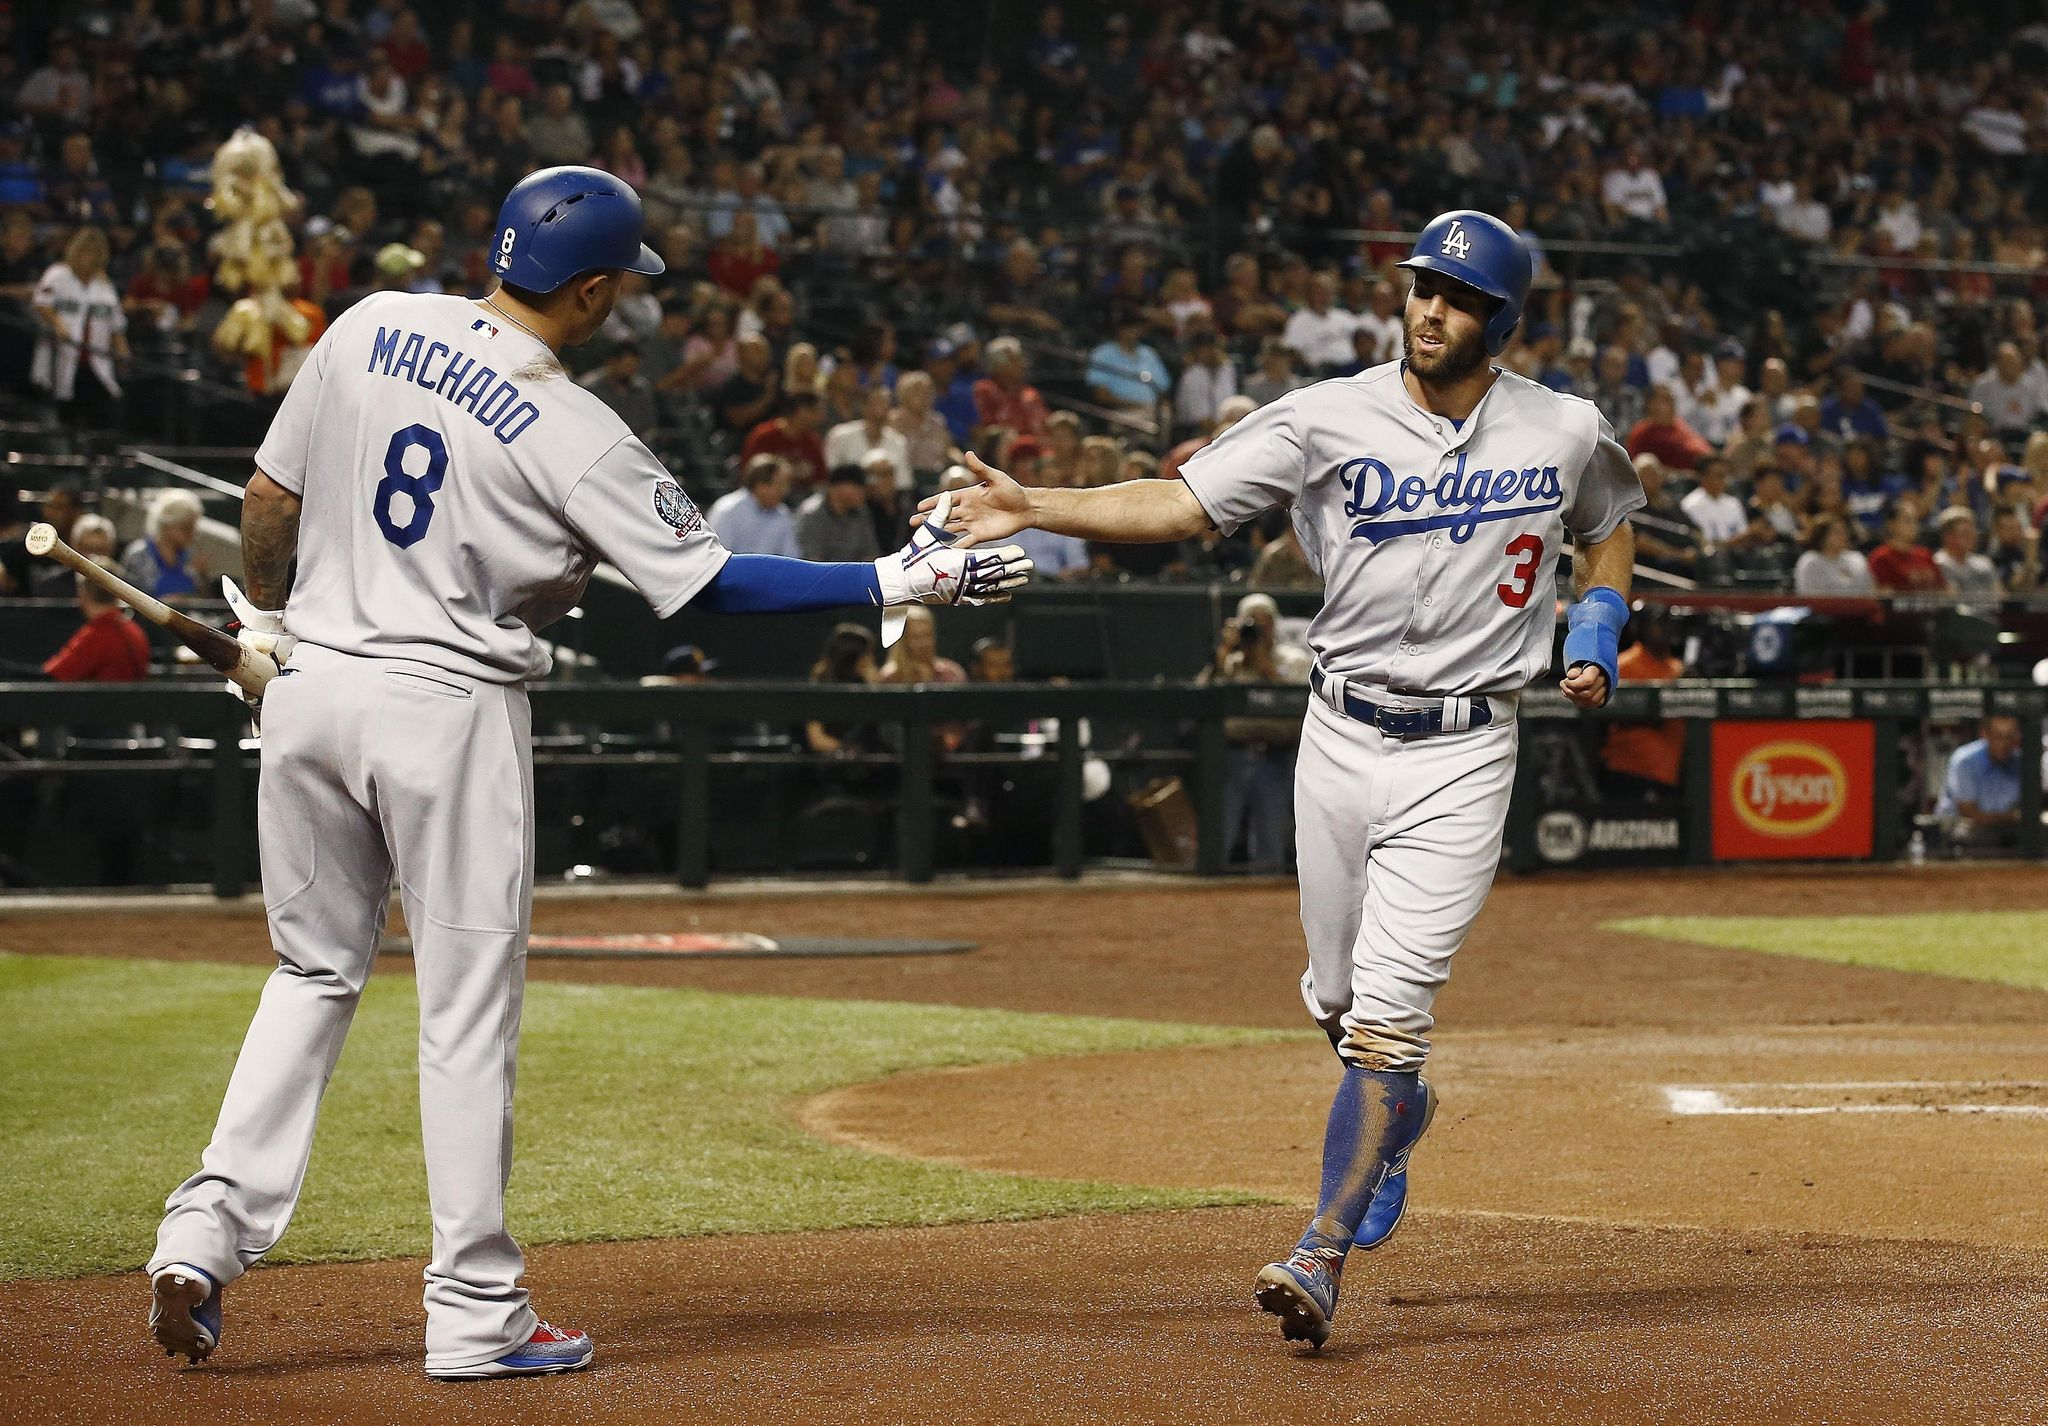 Dodgers_diamondbacks_baseball_38602_s2048x1426